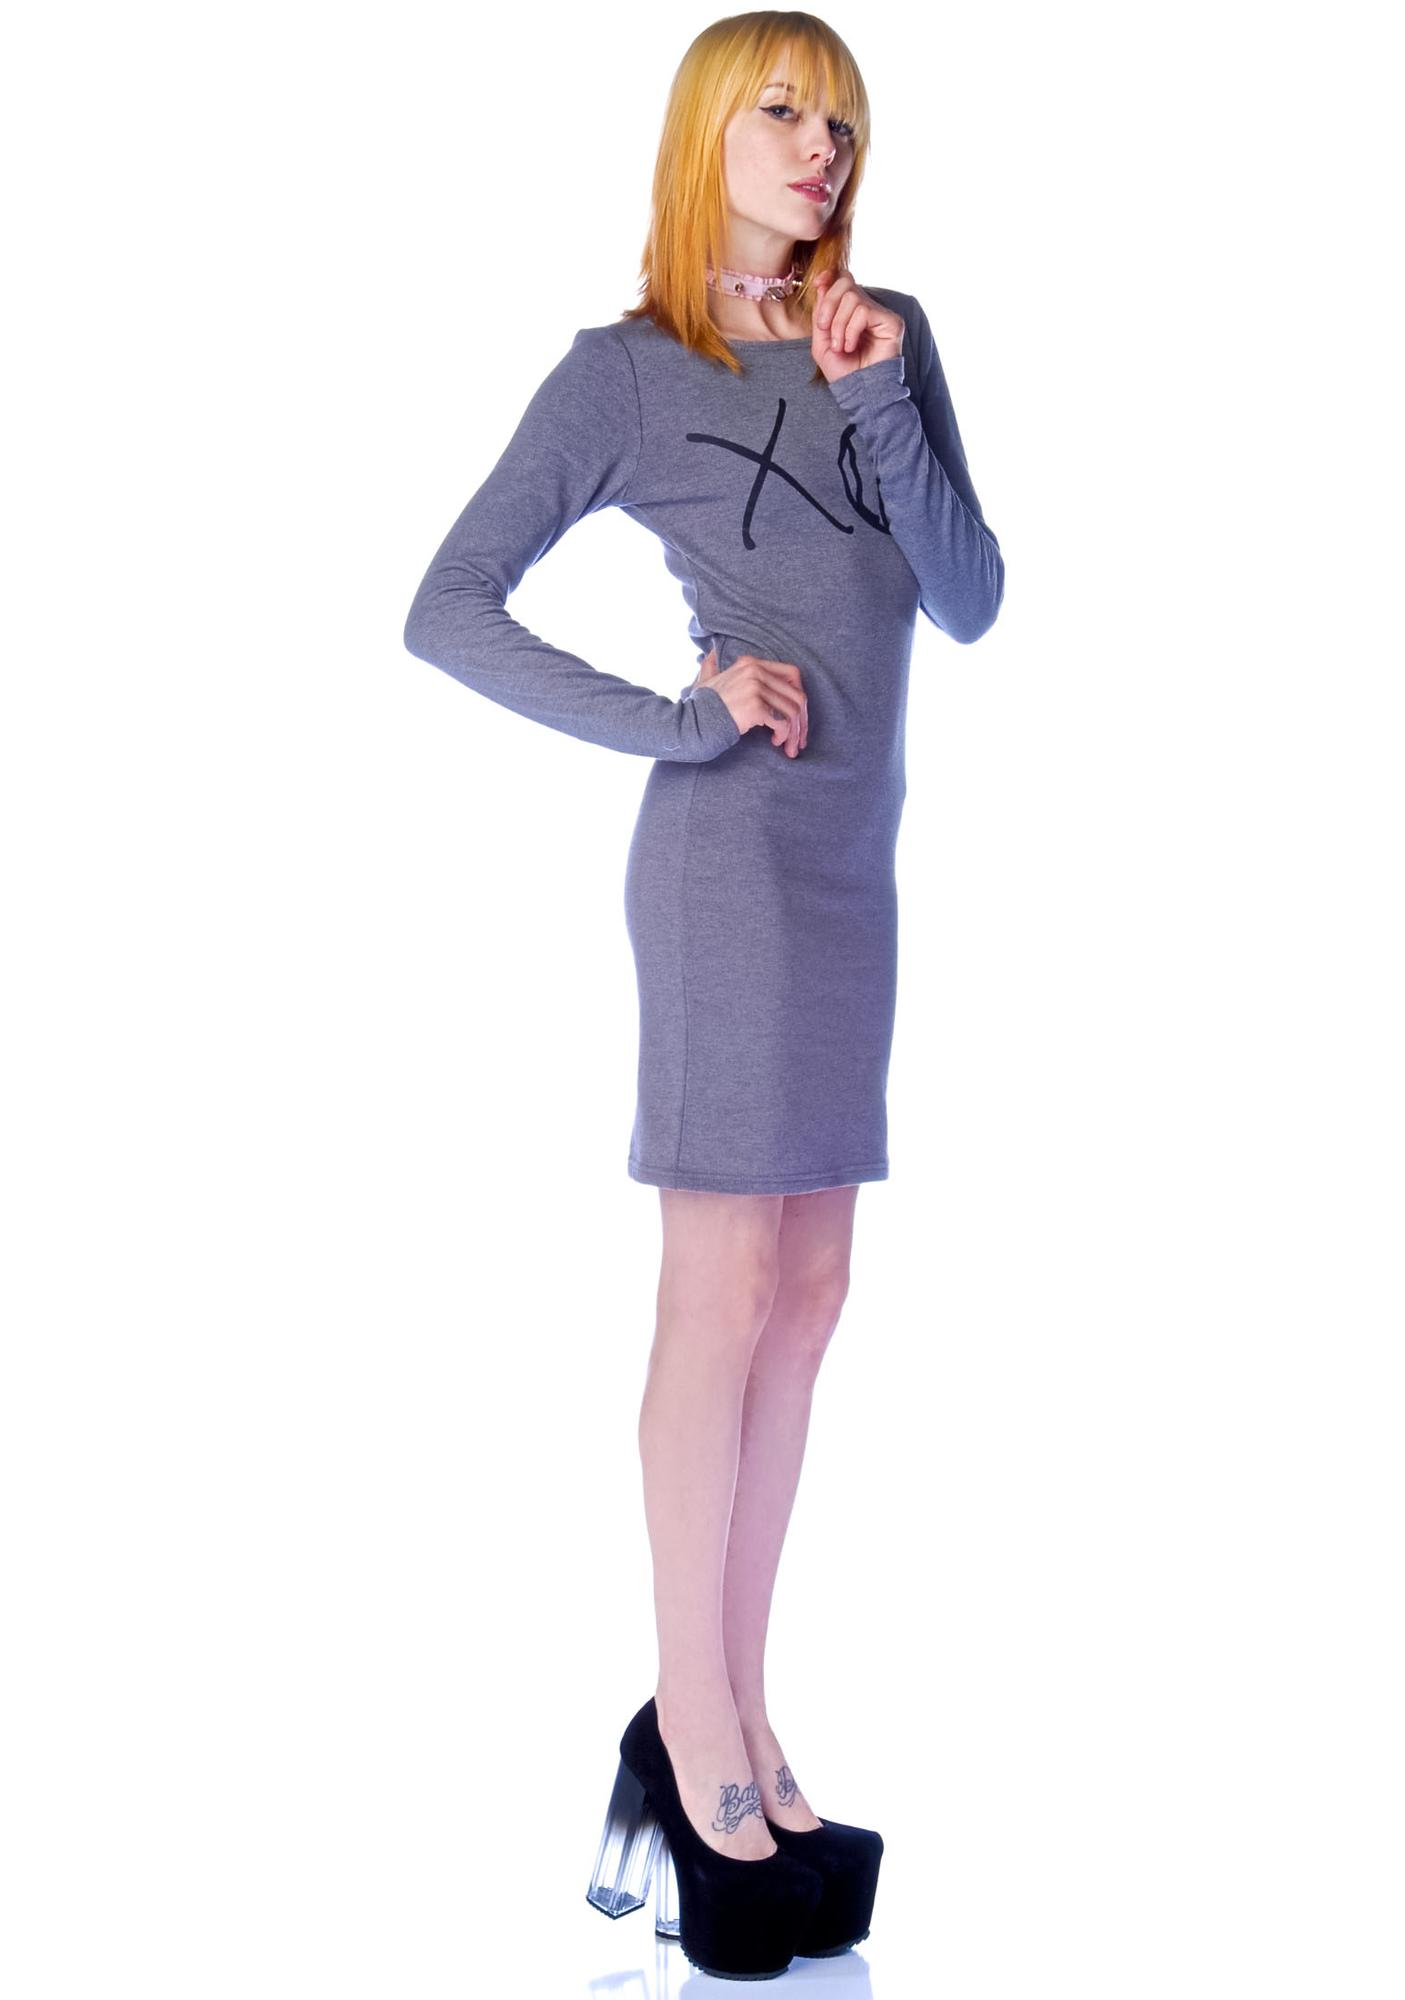 Sauce XO Tight Dress